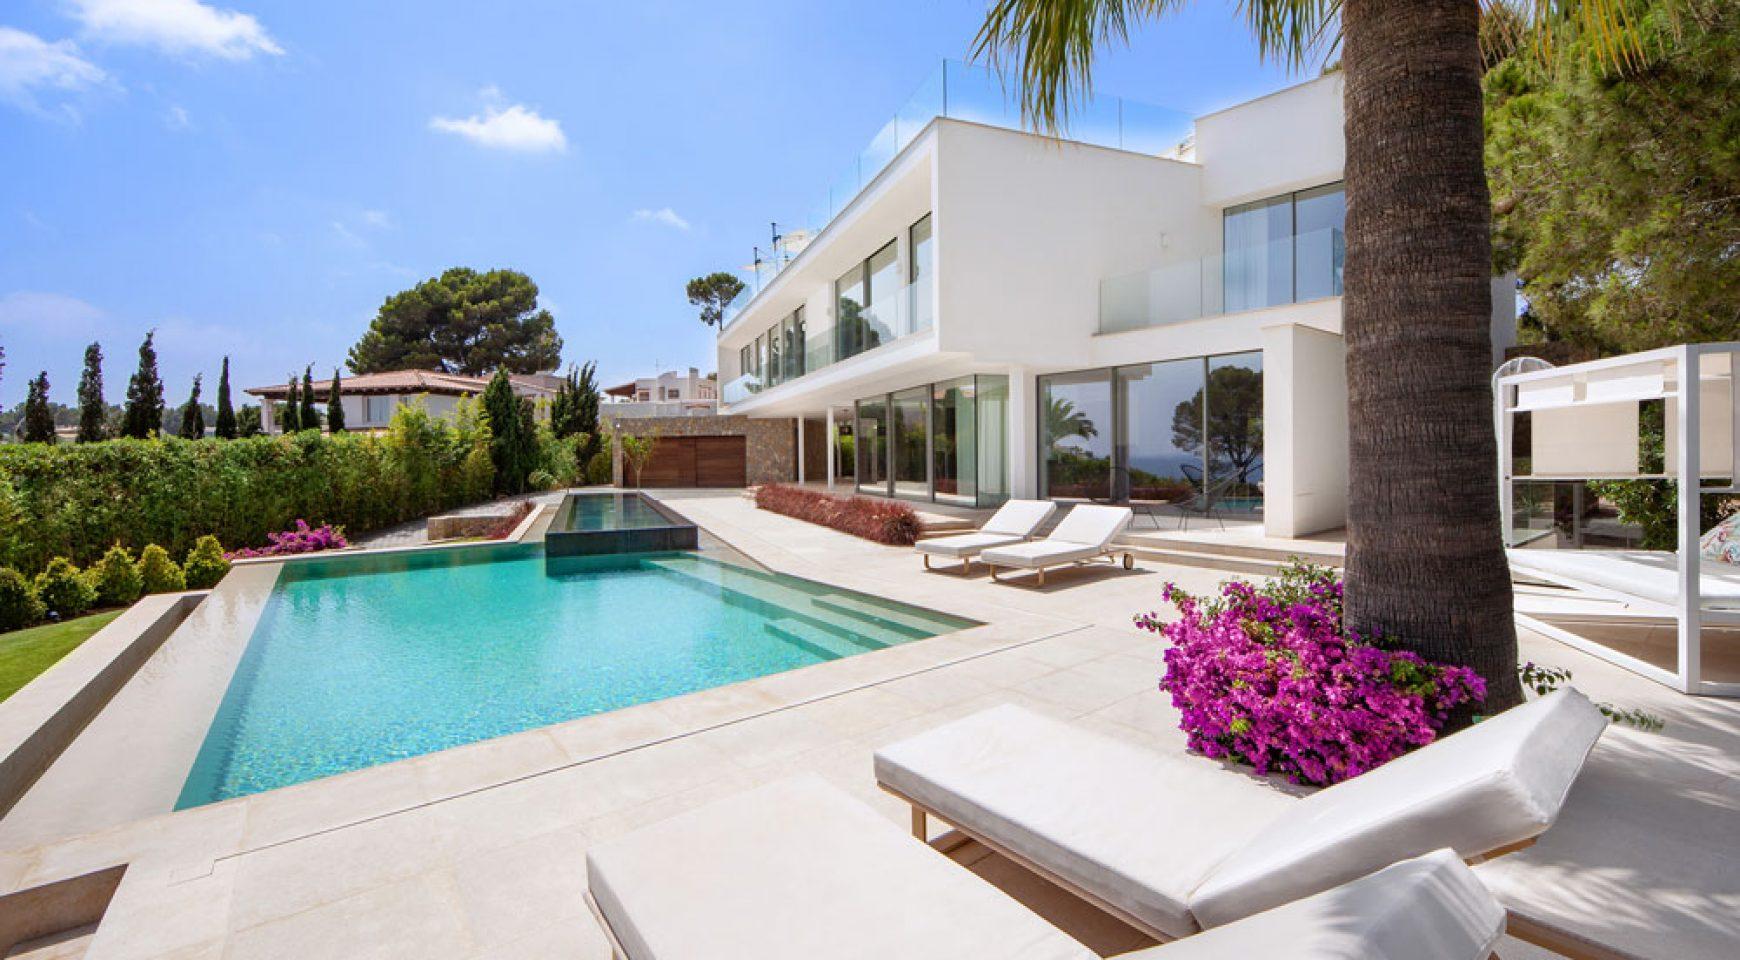 Moderne Meerblick-Villa in Sol de Mallorca – st mallorca